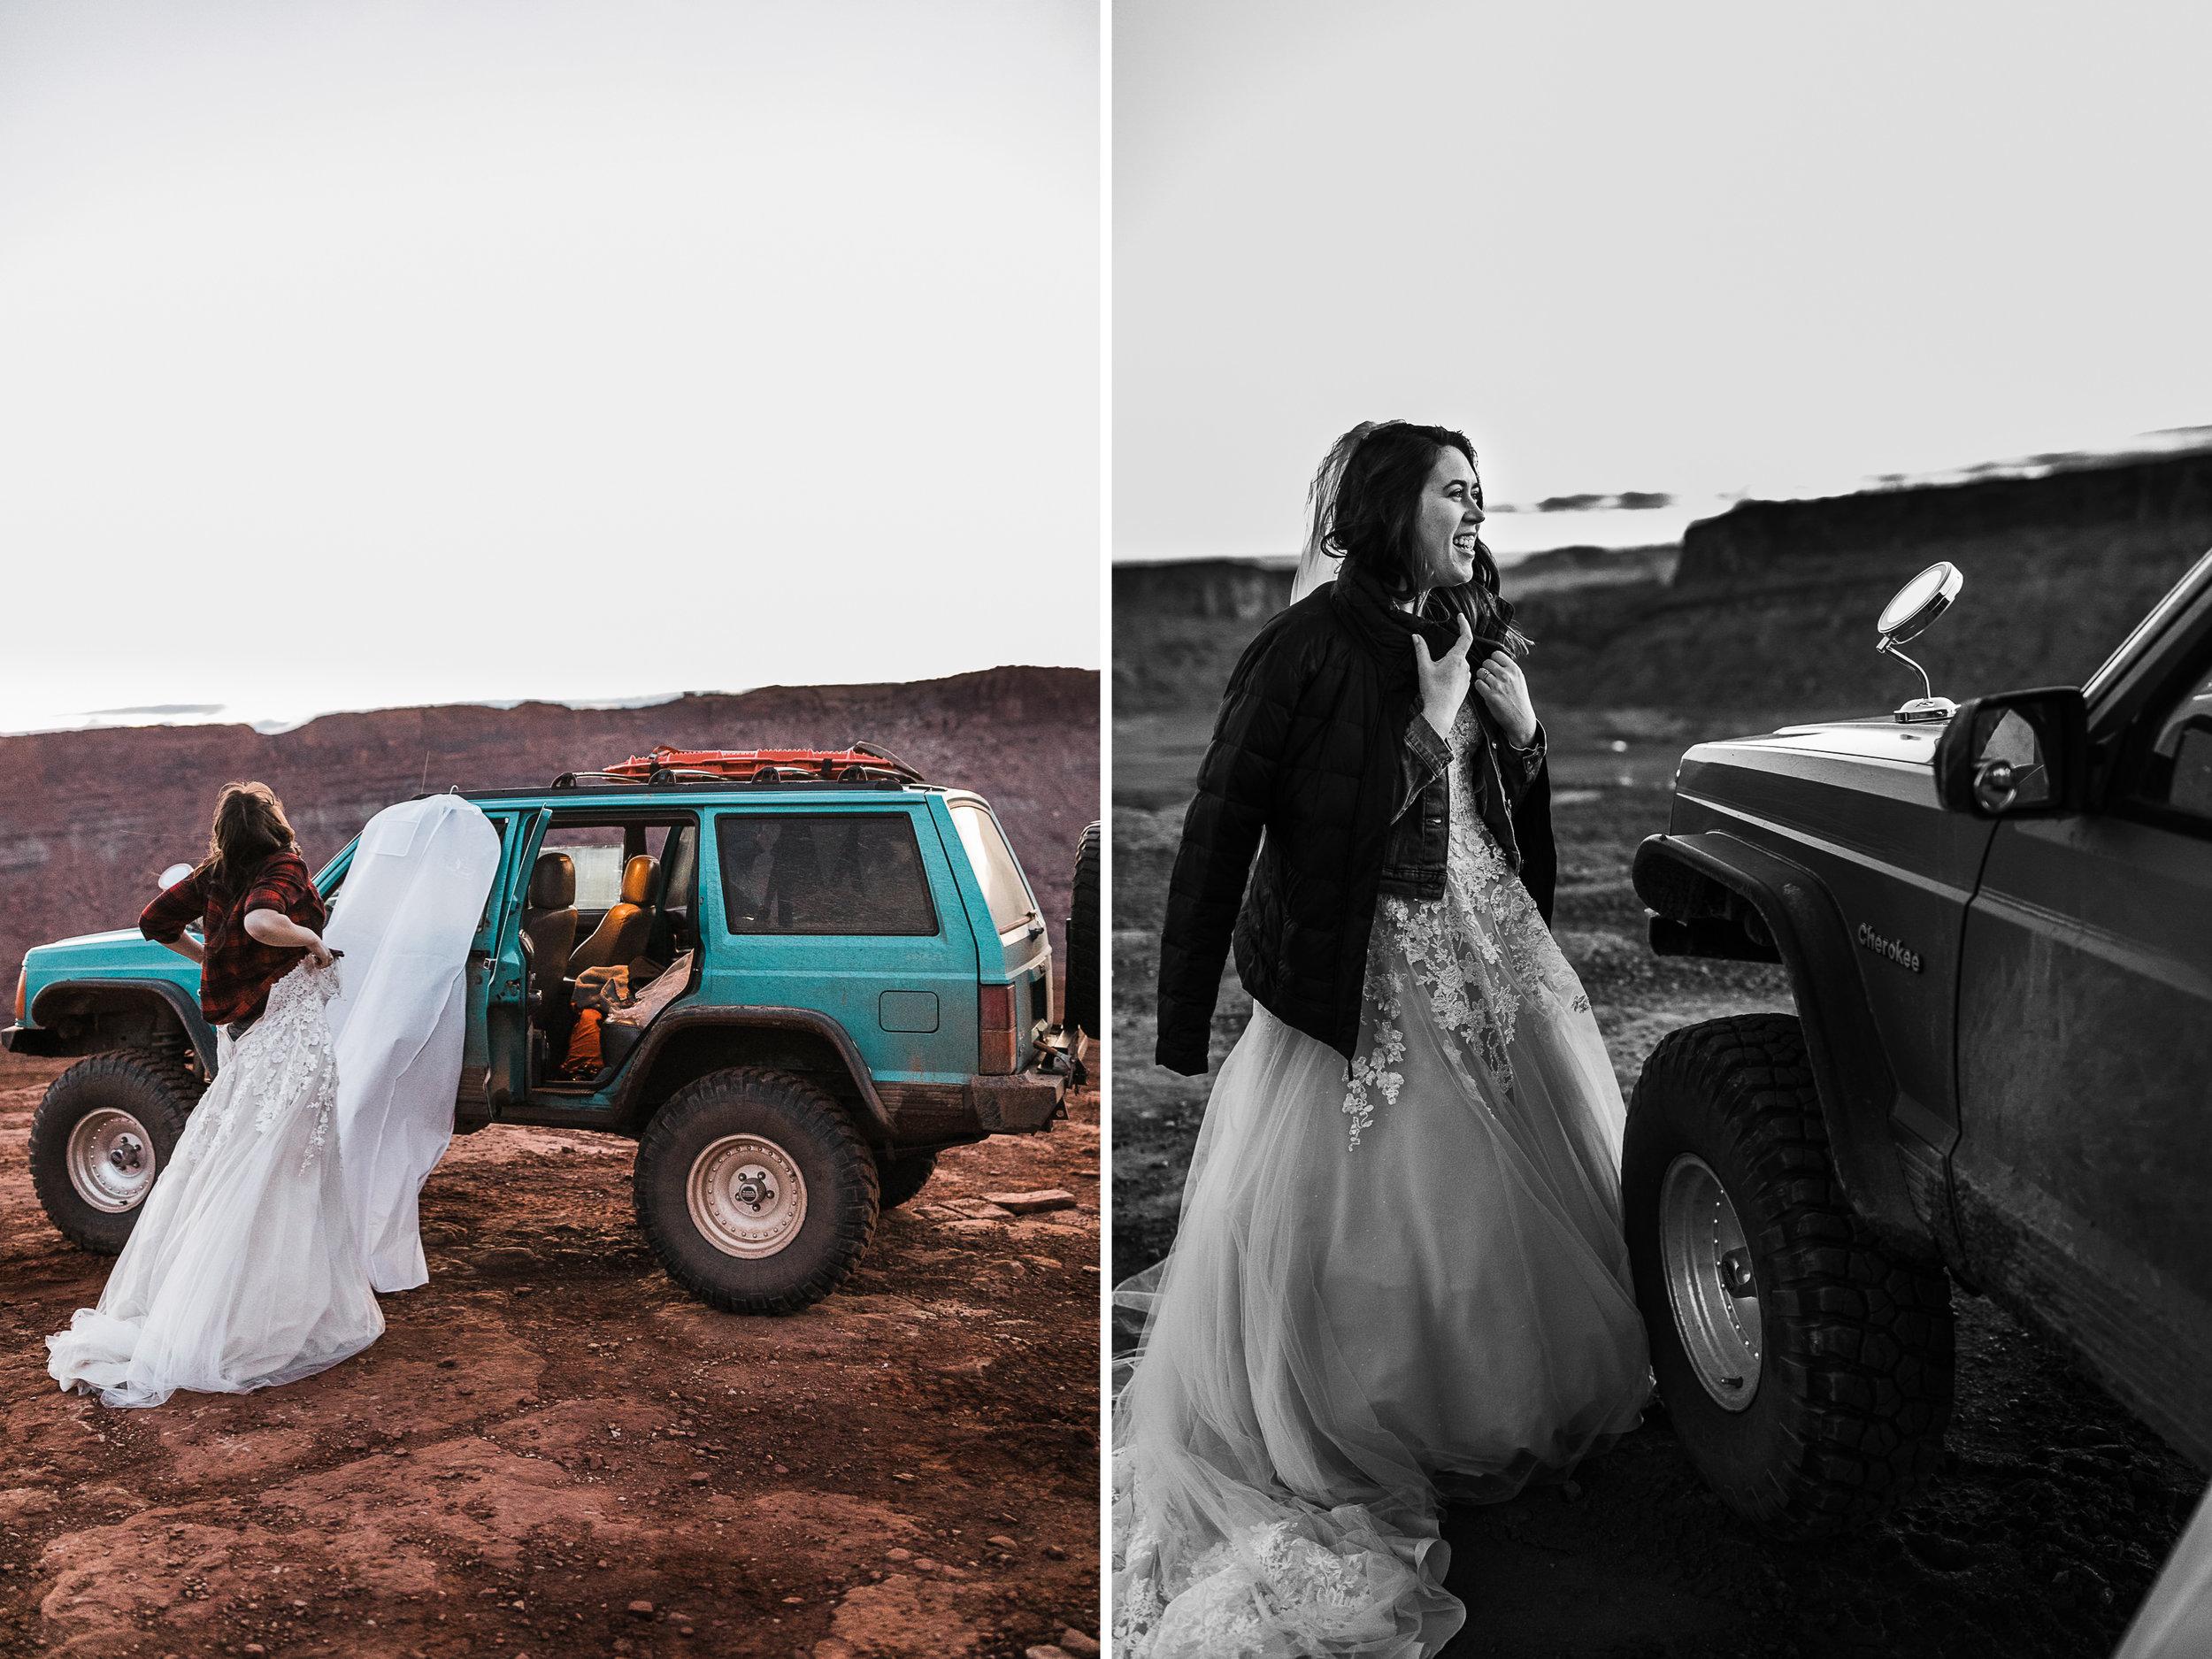 Bride and groom opt for adventurous jeep elopement in Utah's Moab desert.